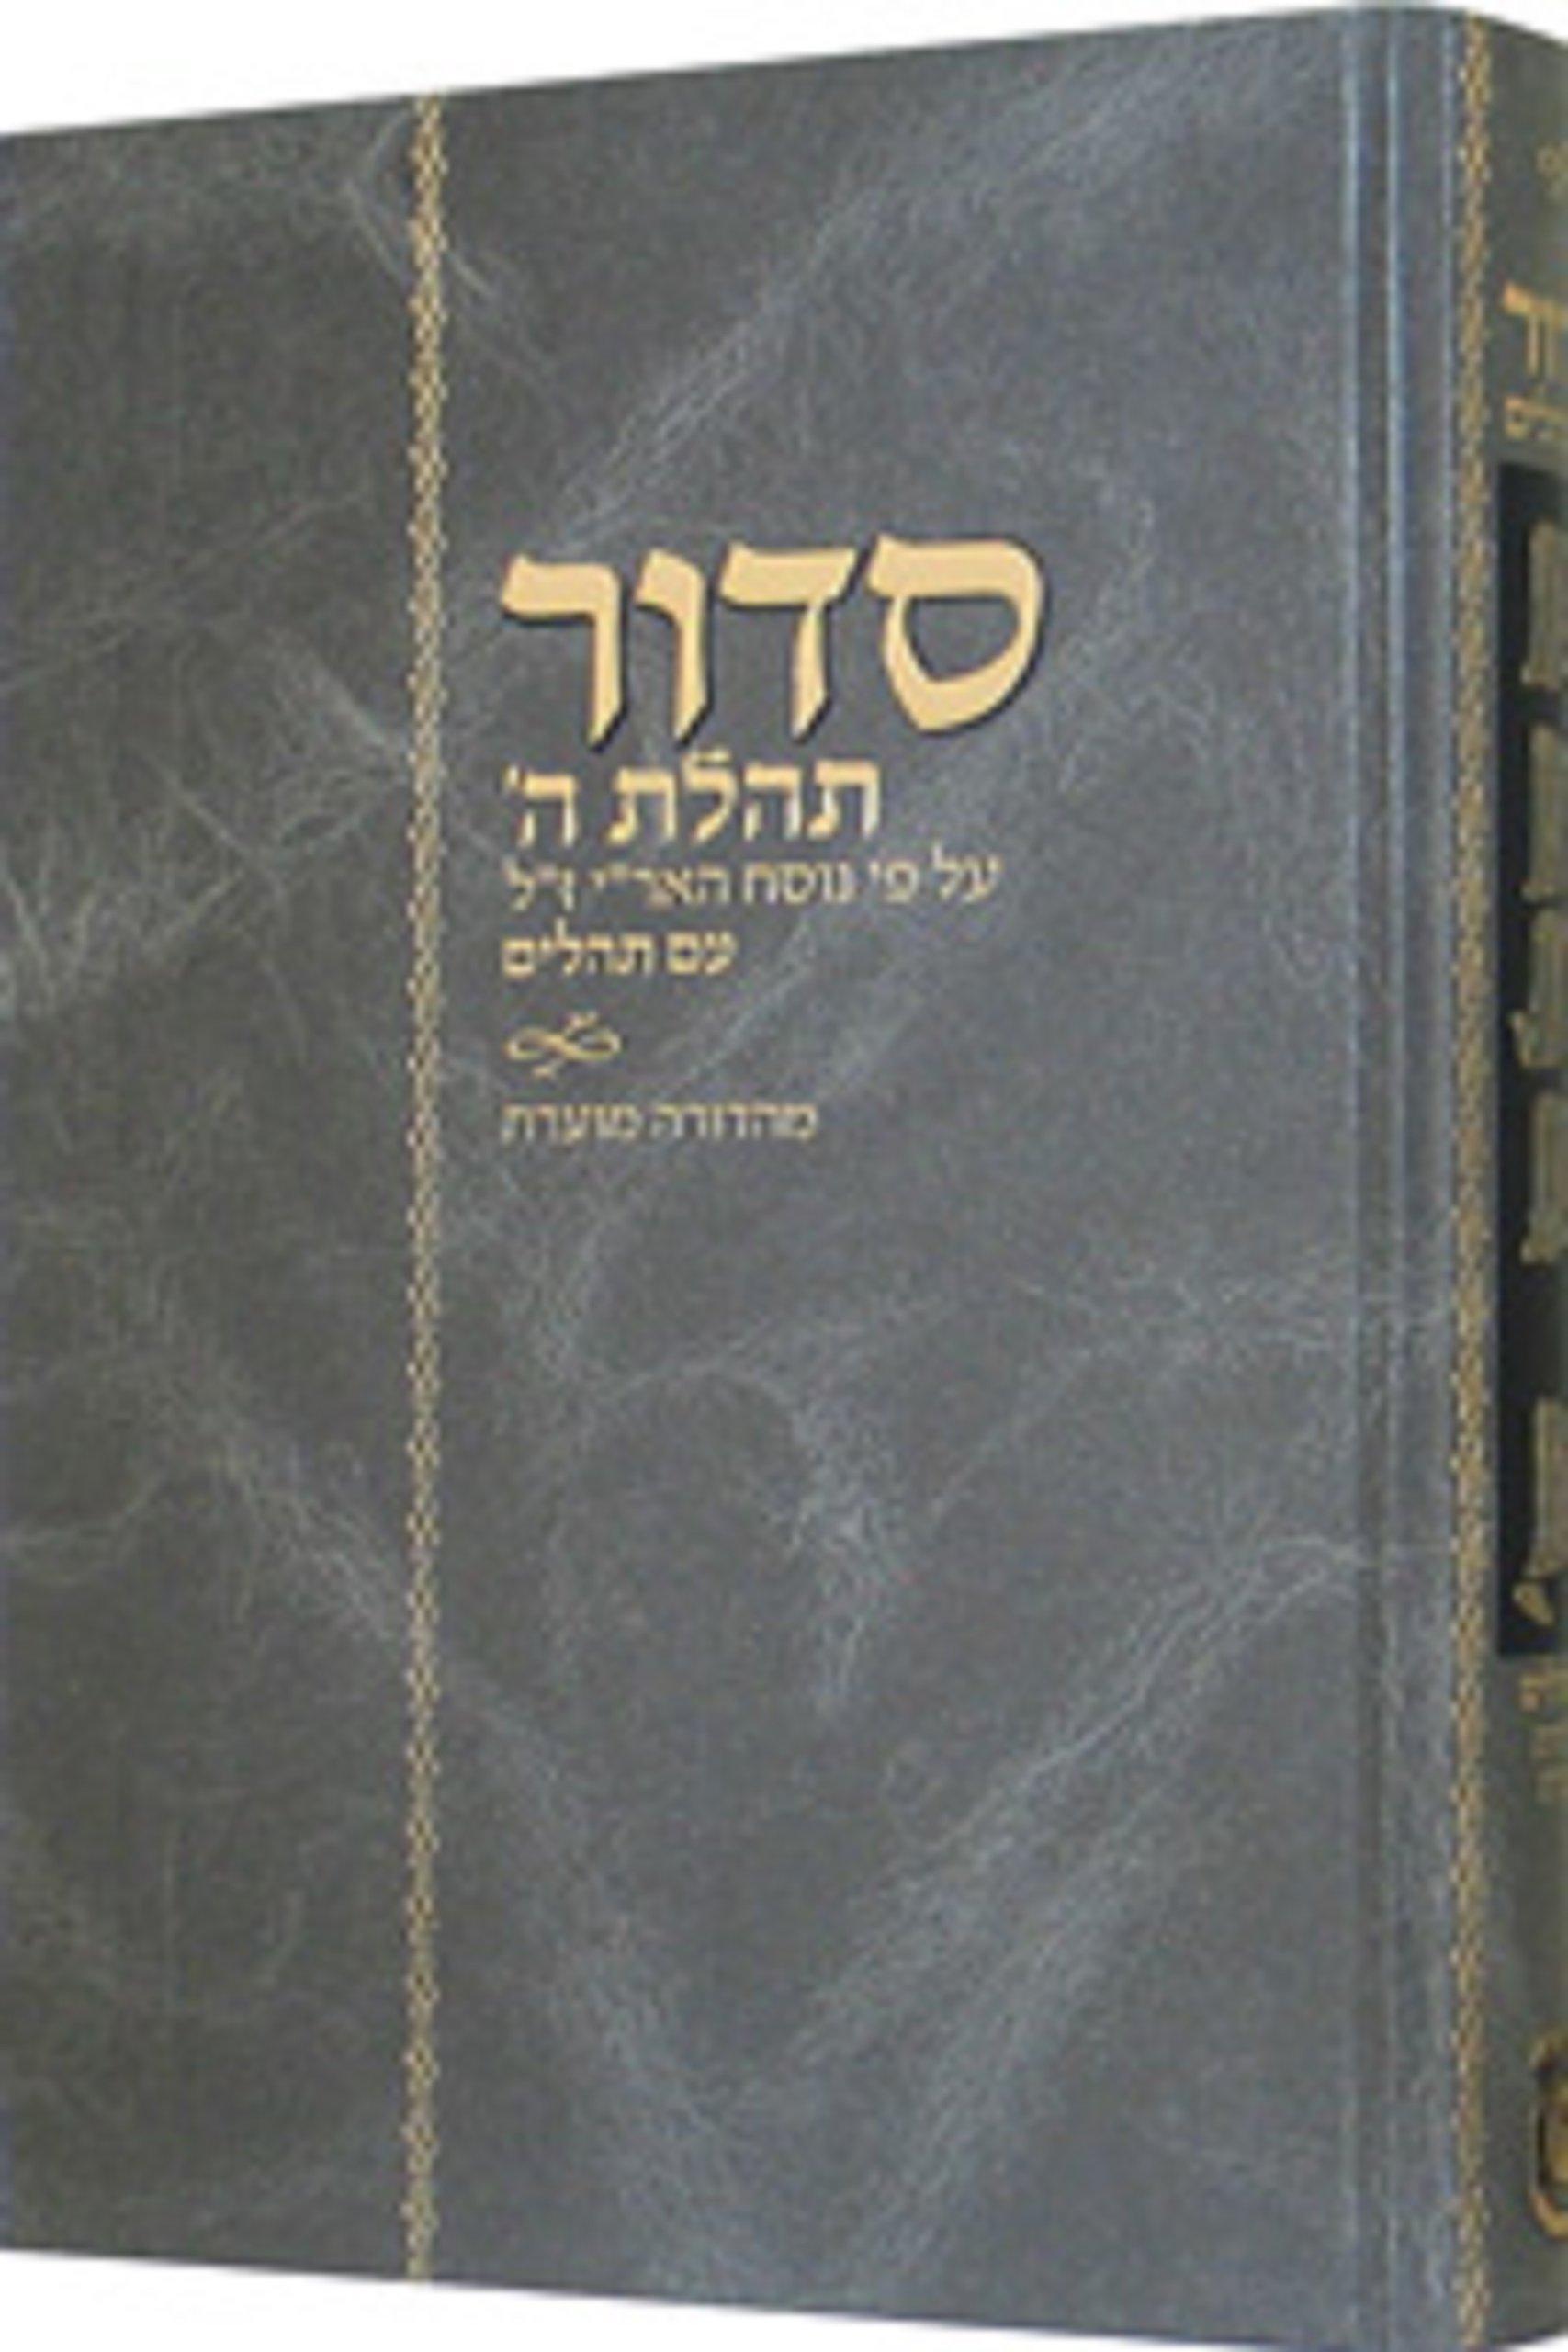 Siddur - Mahadurah Mueret Im Tehillim 5.5 x 8.5 (Hebrew Edition)